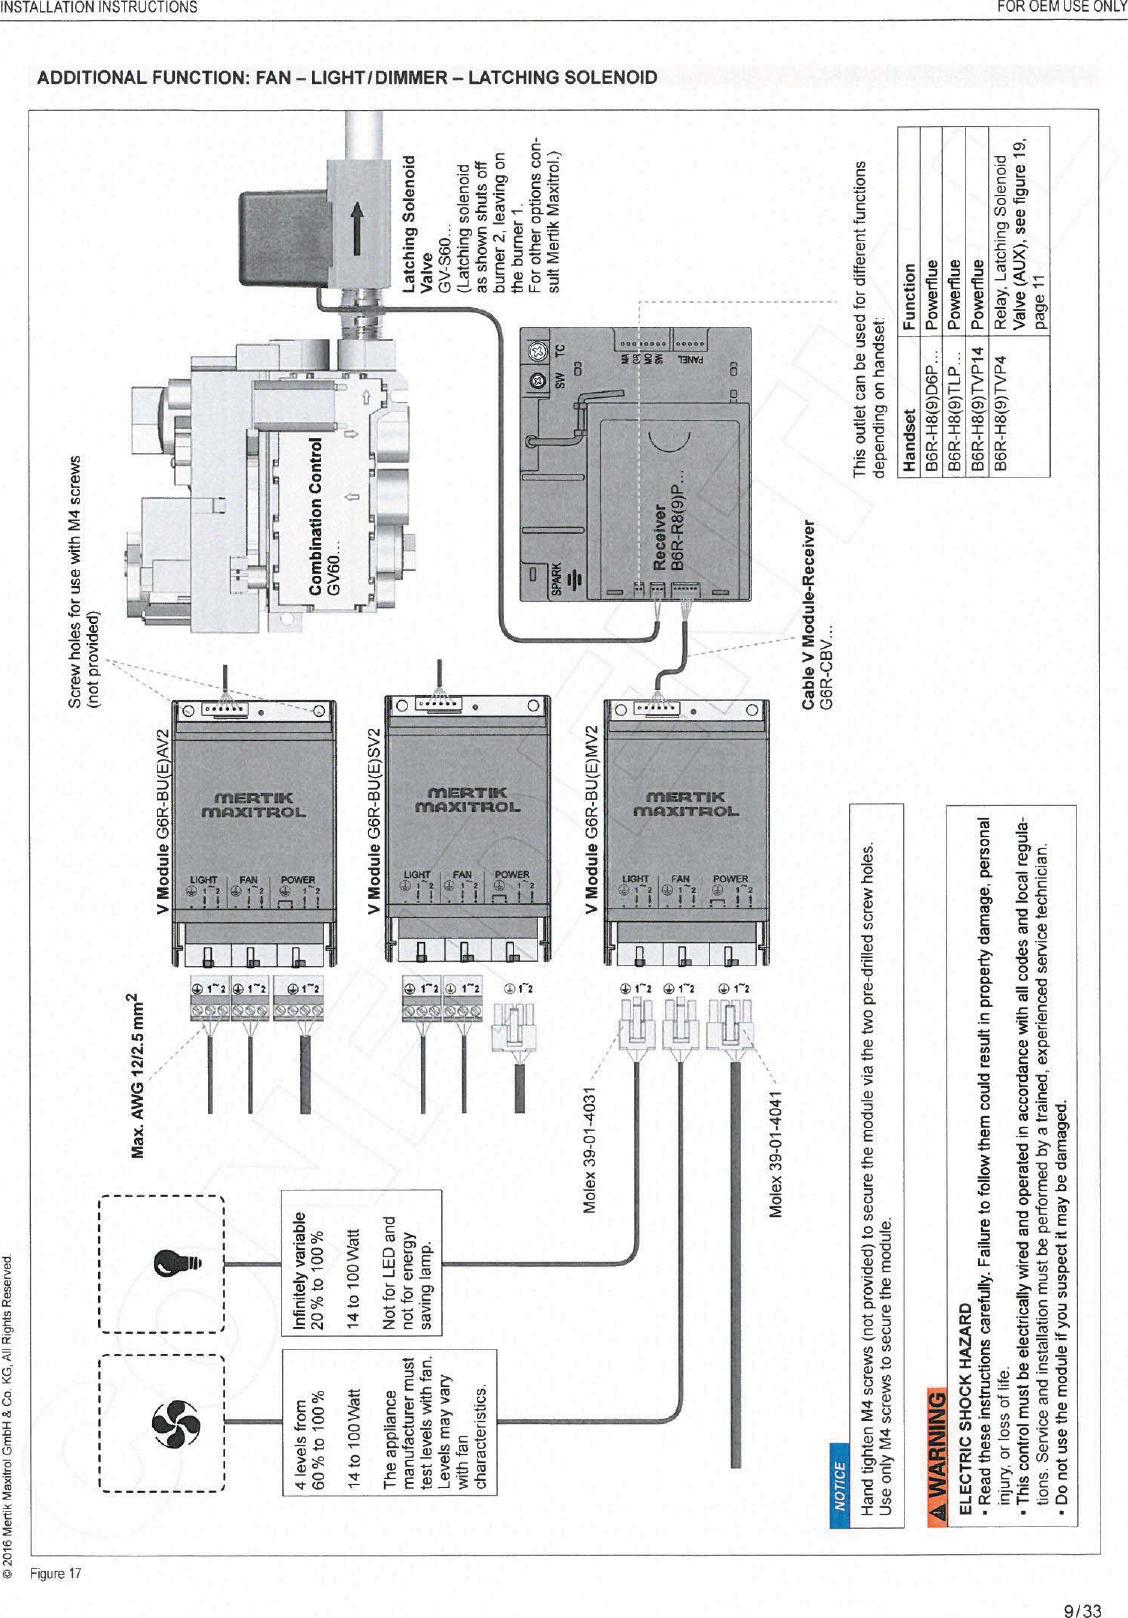 Whitehead Gas Valve Wiring Diagram - Anything Wiring Diagrams •